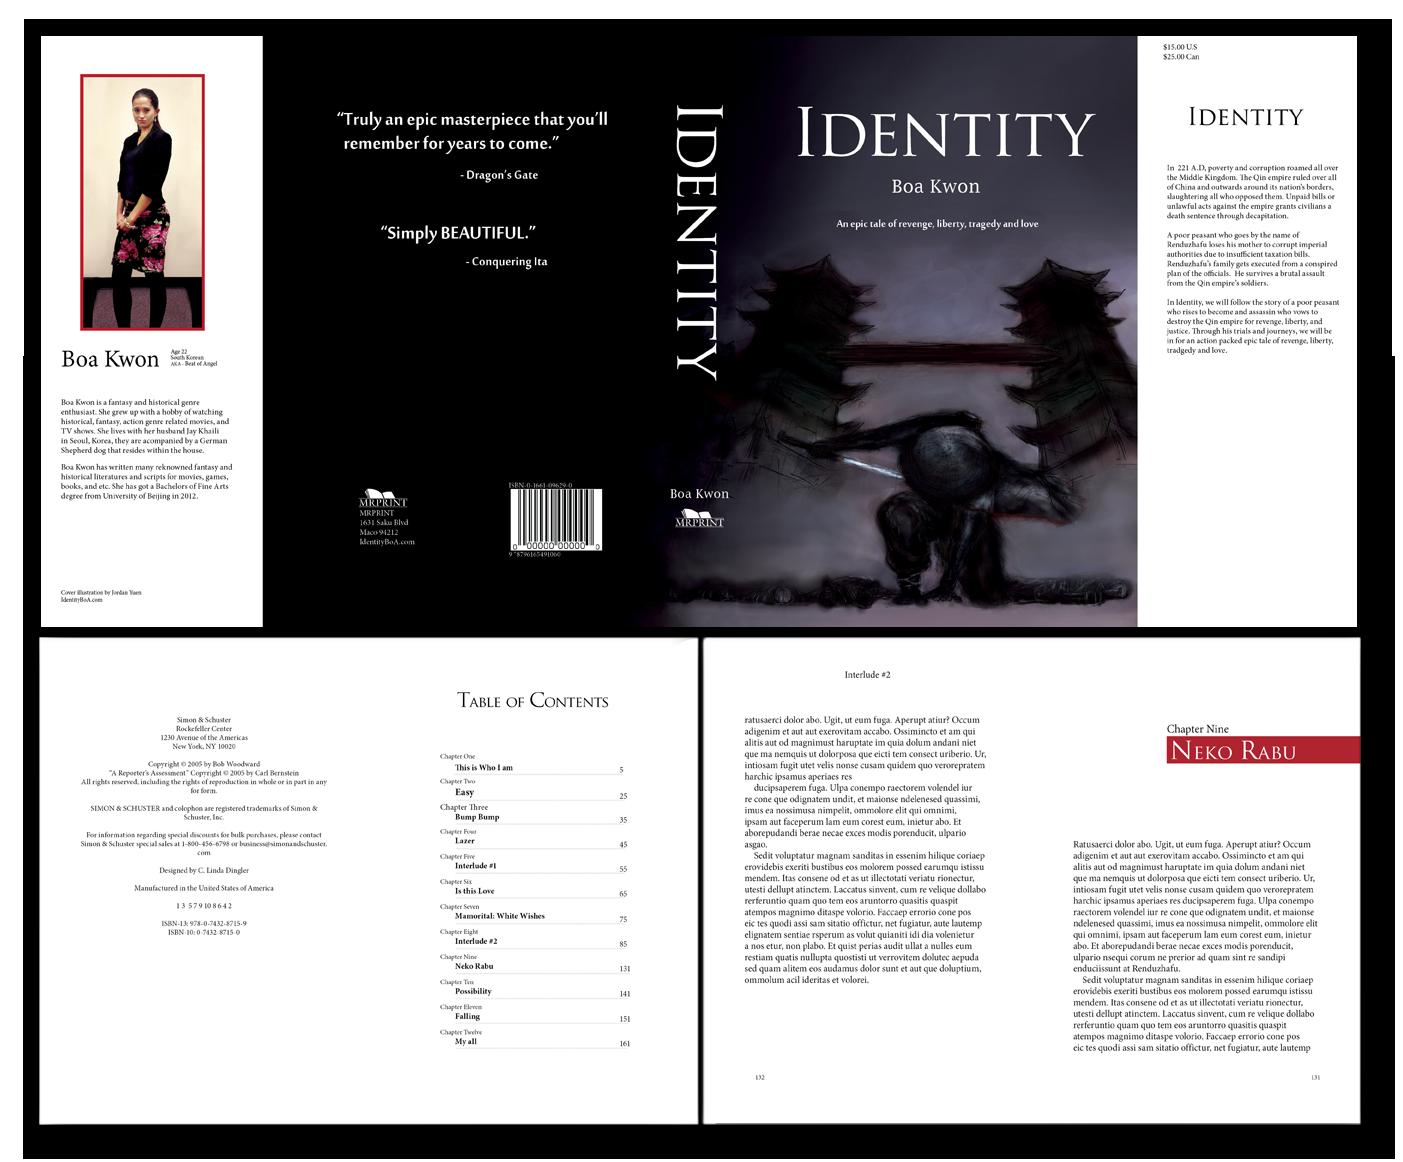 Identity Dust Jacket Cover